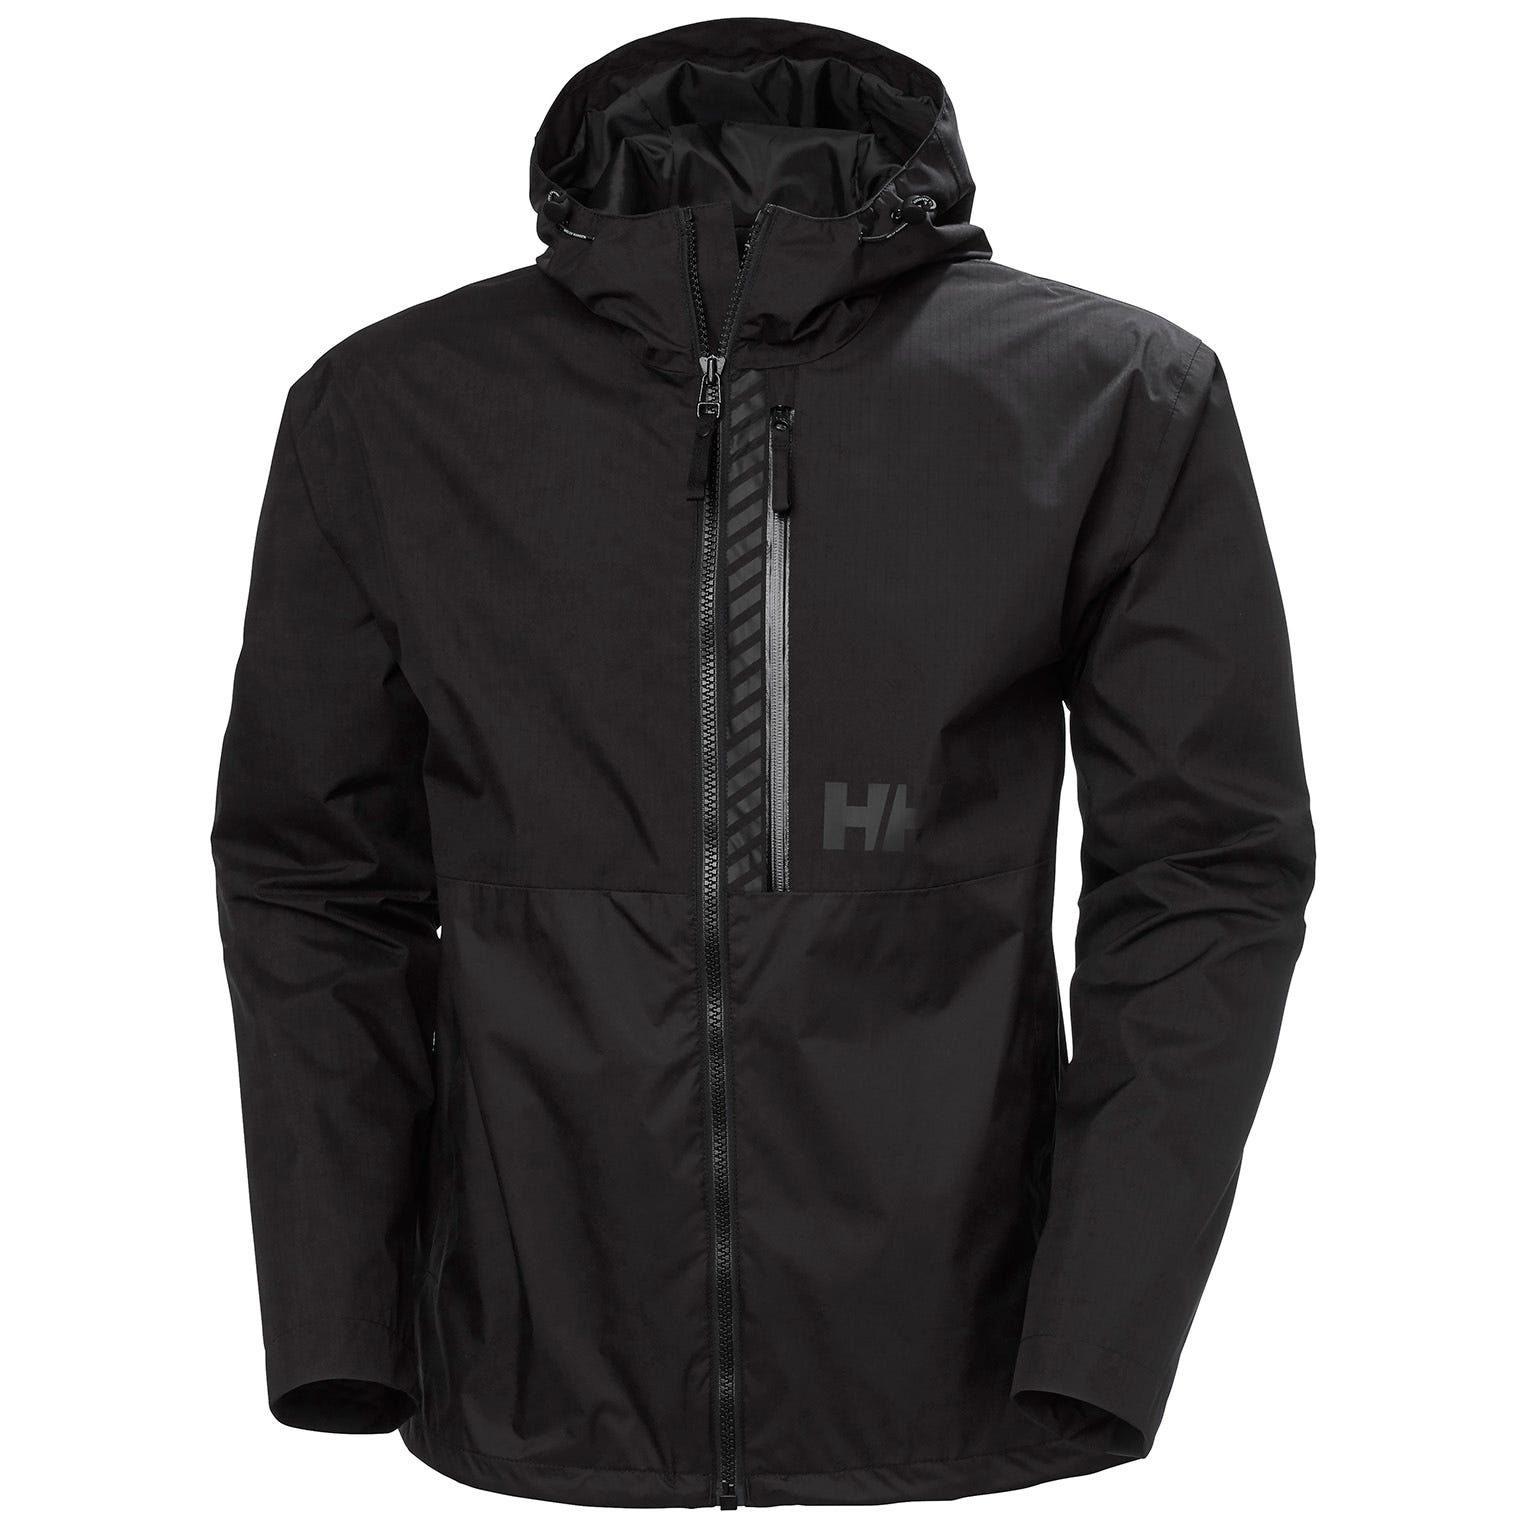 Helly Hansen Mens Active Pace Waterproof Urban Jacket S